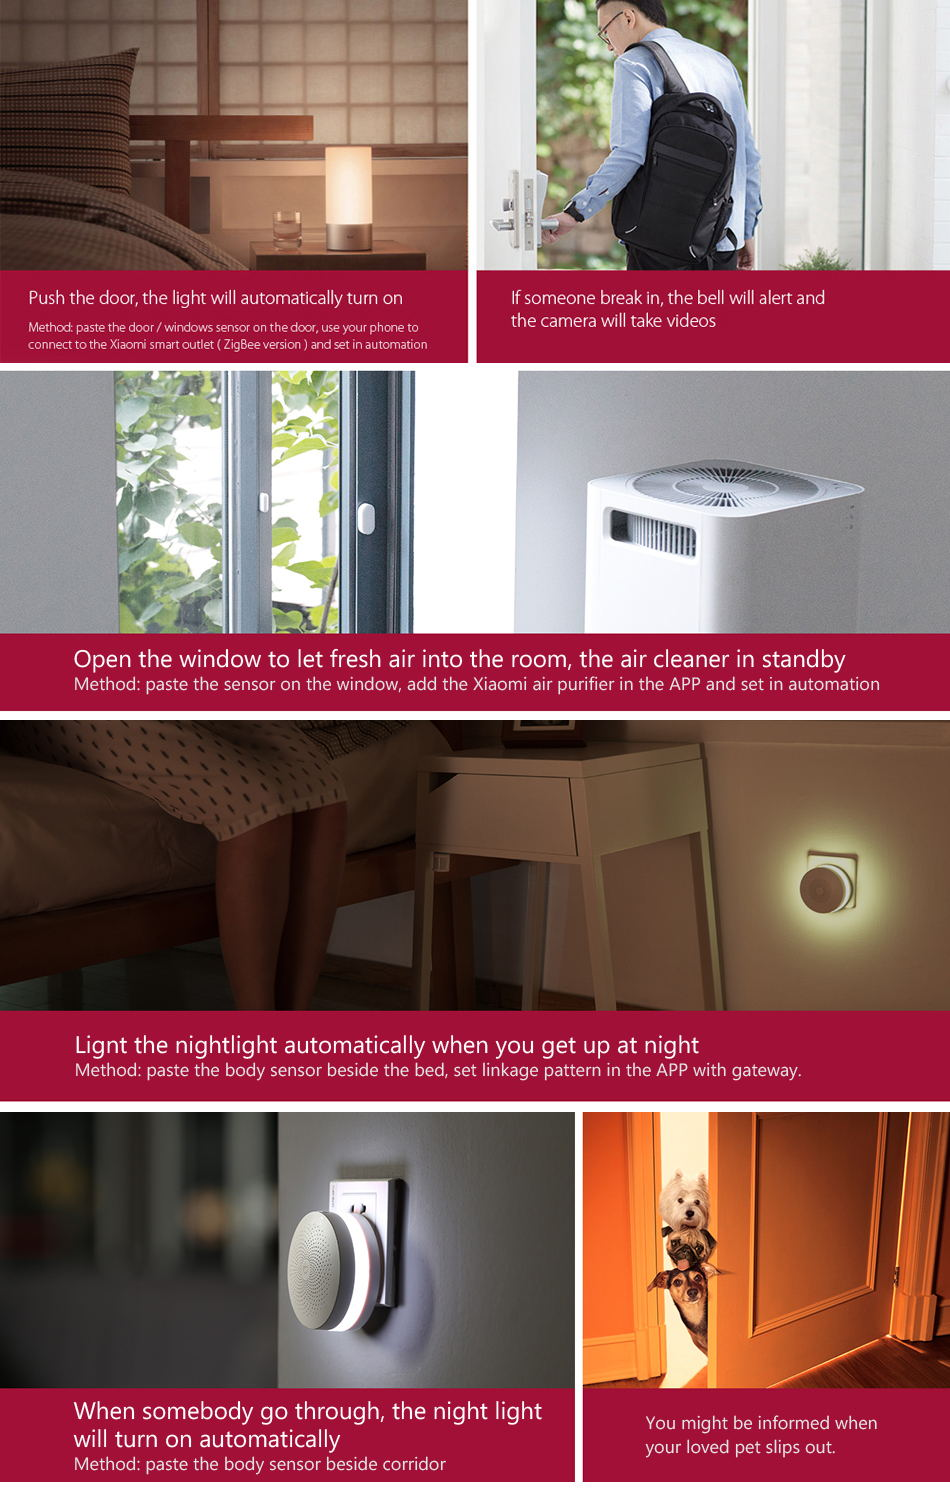 xiaomi mijia smart home security kit